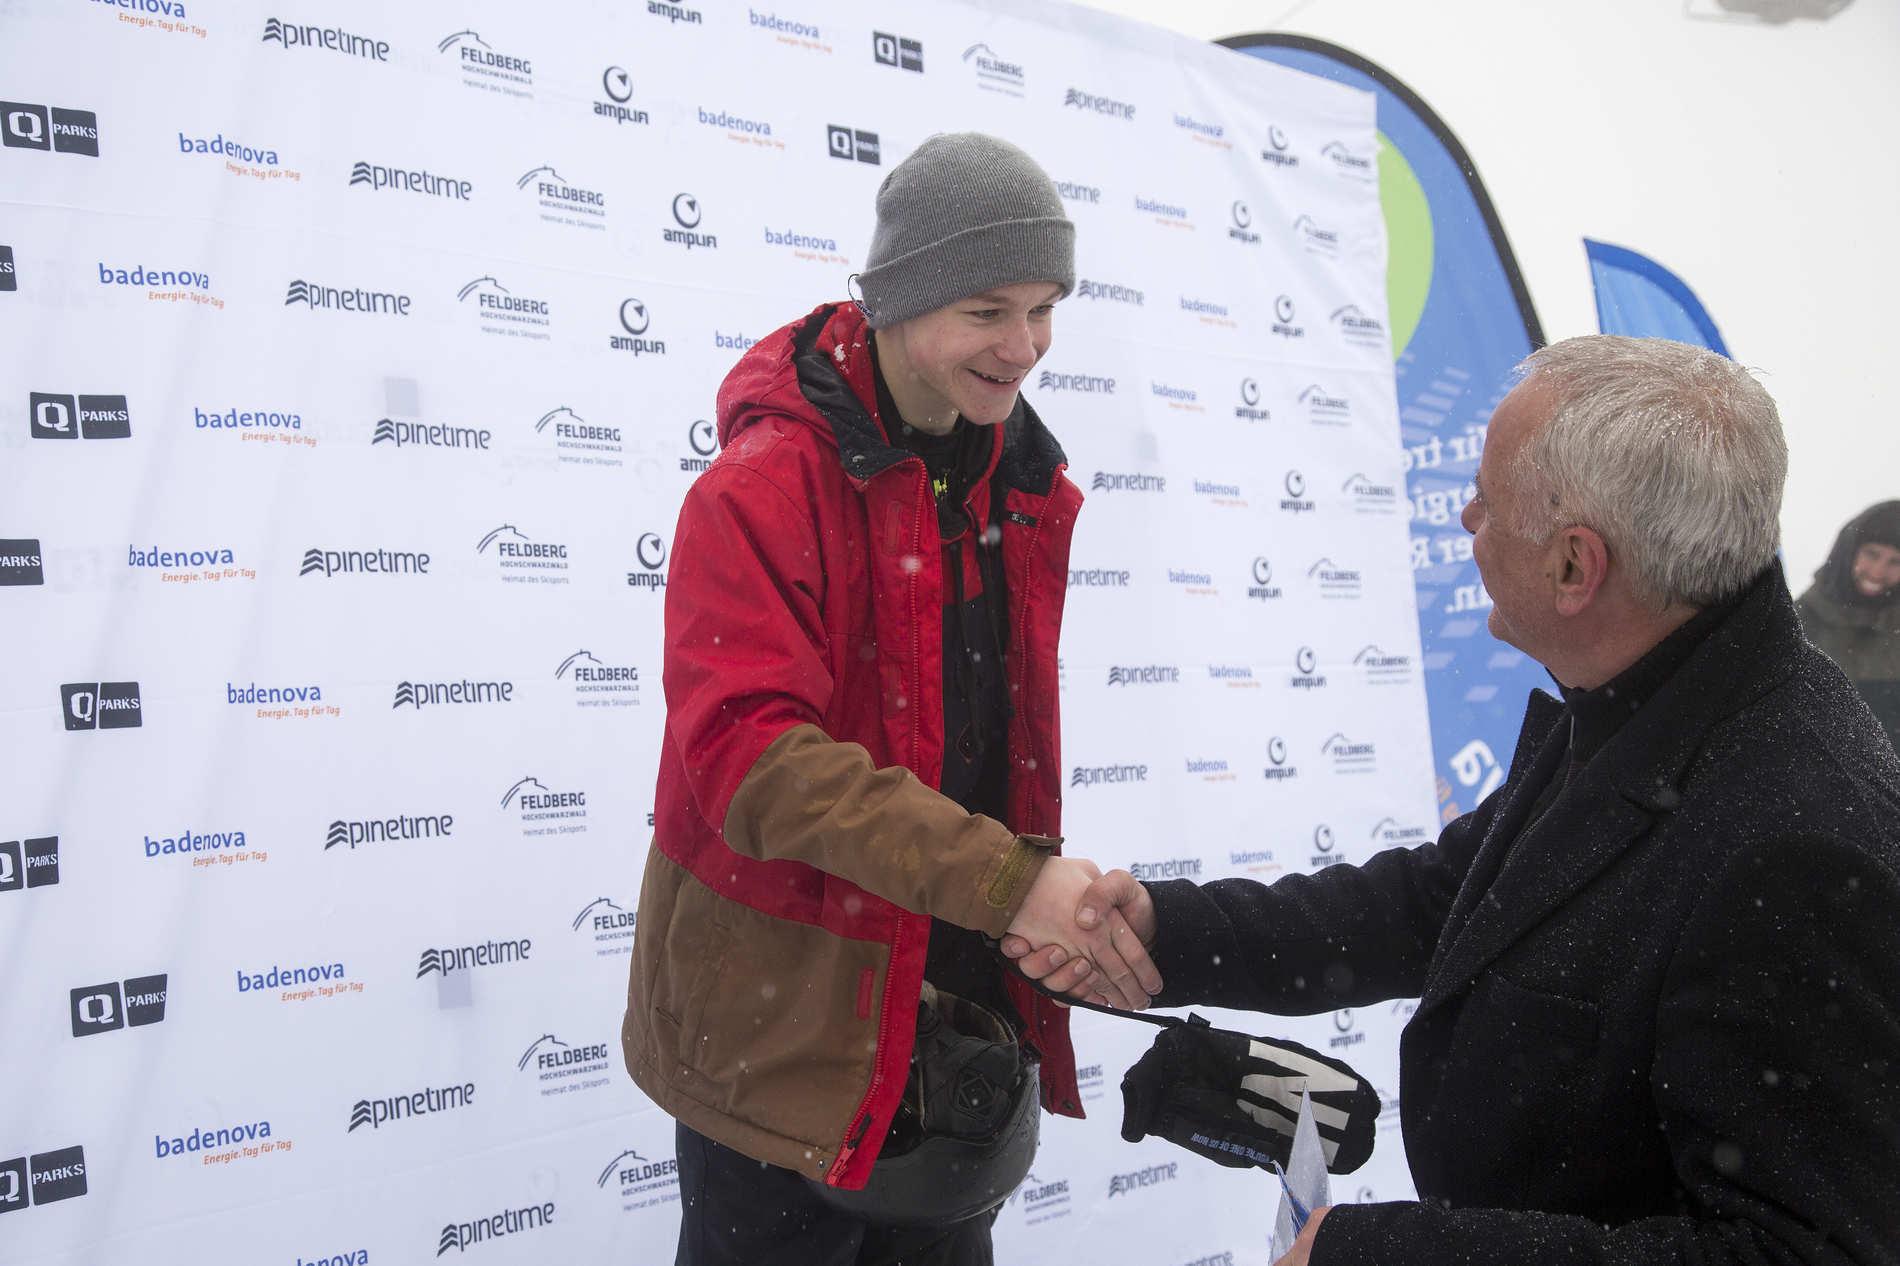 web snowpark feldberg 17 02 2018 lifestyle fs sb martin herrmann qparks 30